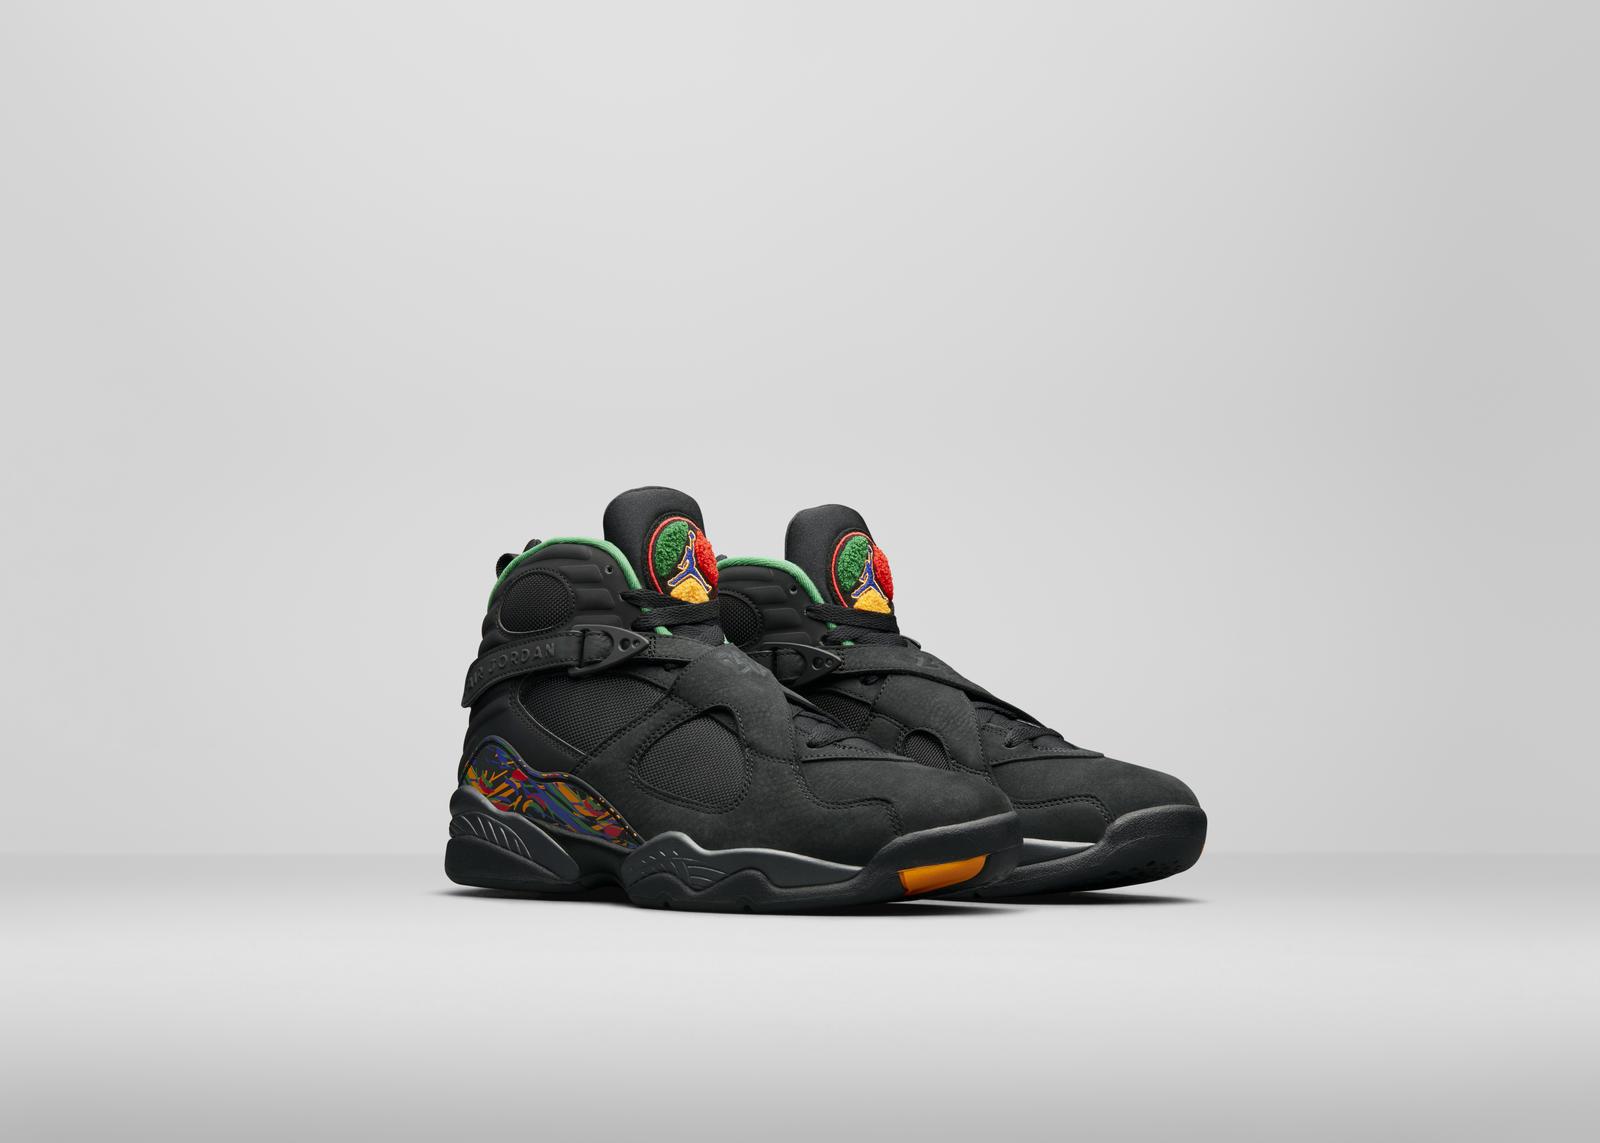 Jordan Brand 2018 Holiday Releases